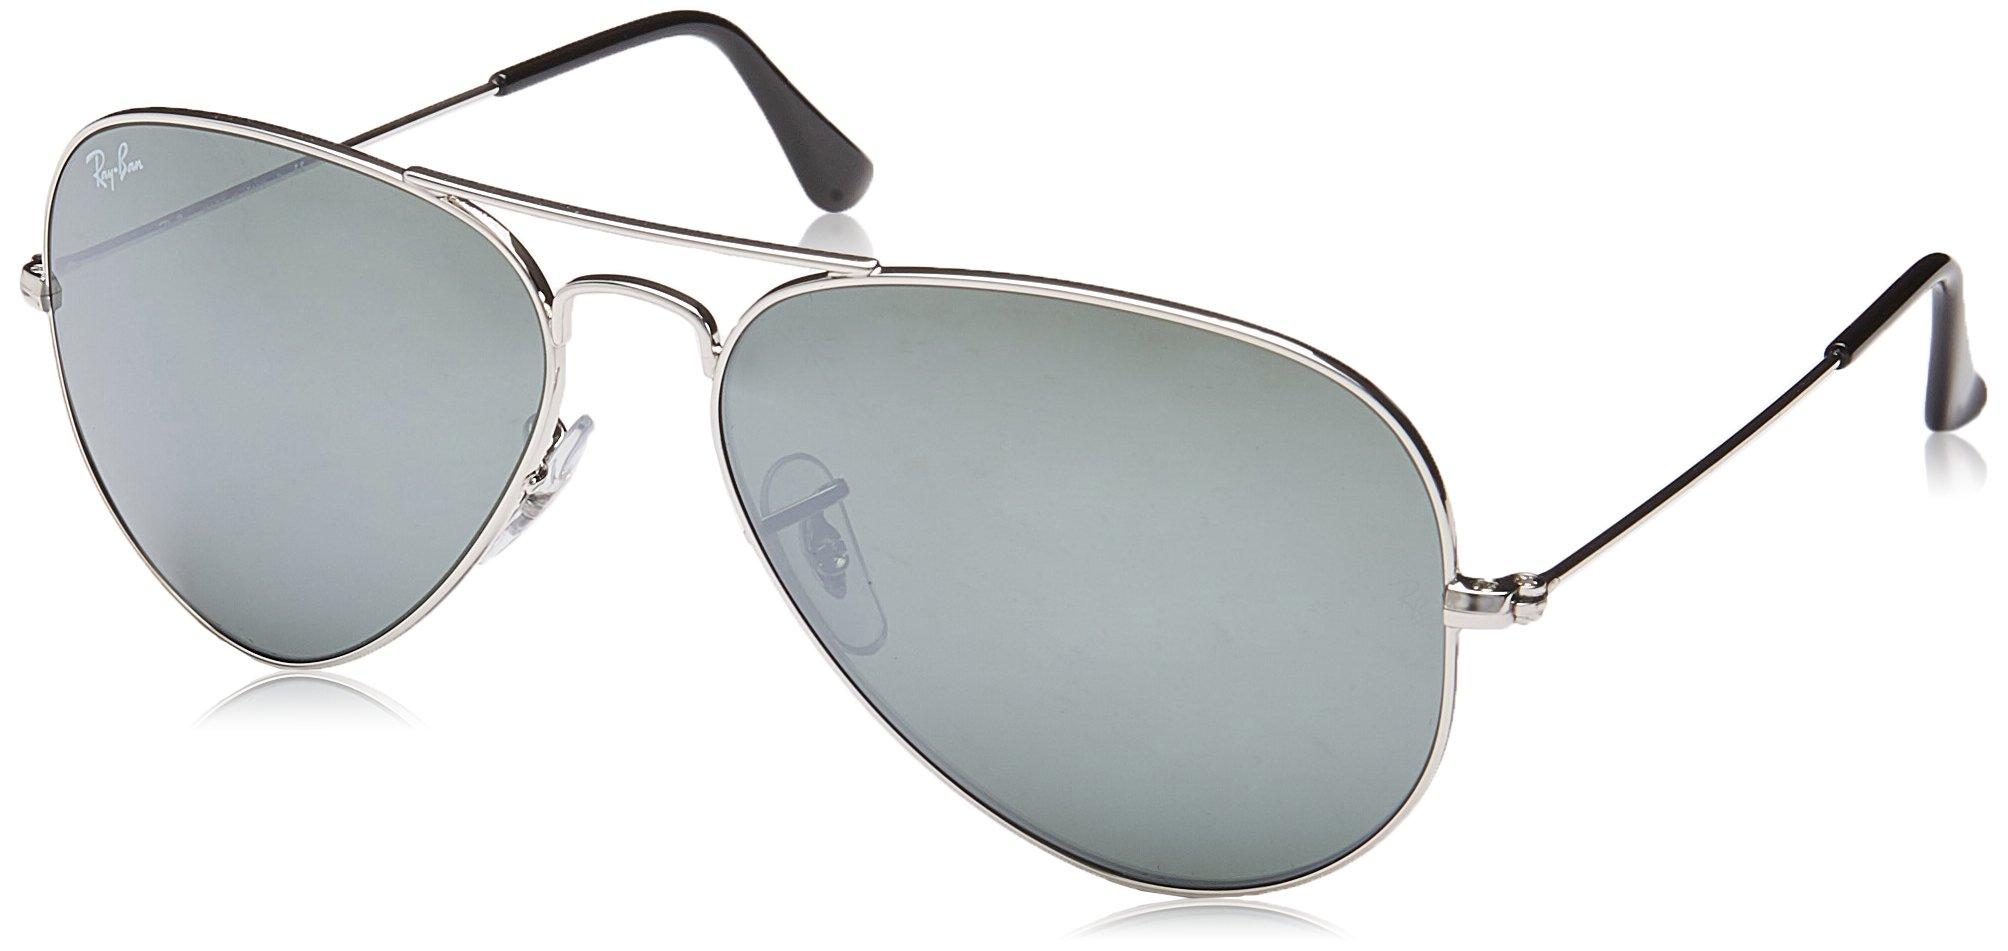 Ray-Ban 3025 Aviator Large Metal Mirrored Non-Polarized Sunglasses, Silver/Silver Mirror (W3277), 58mm